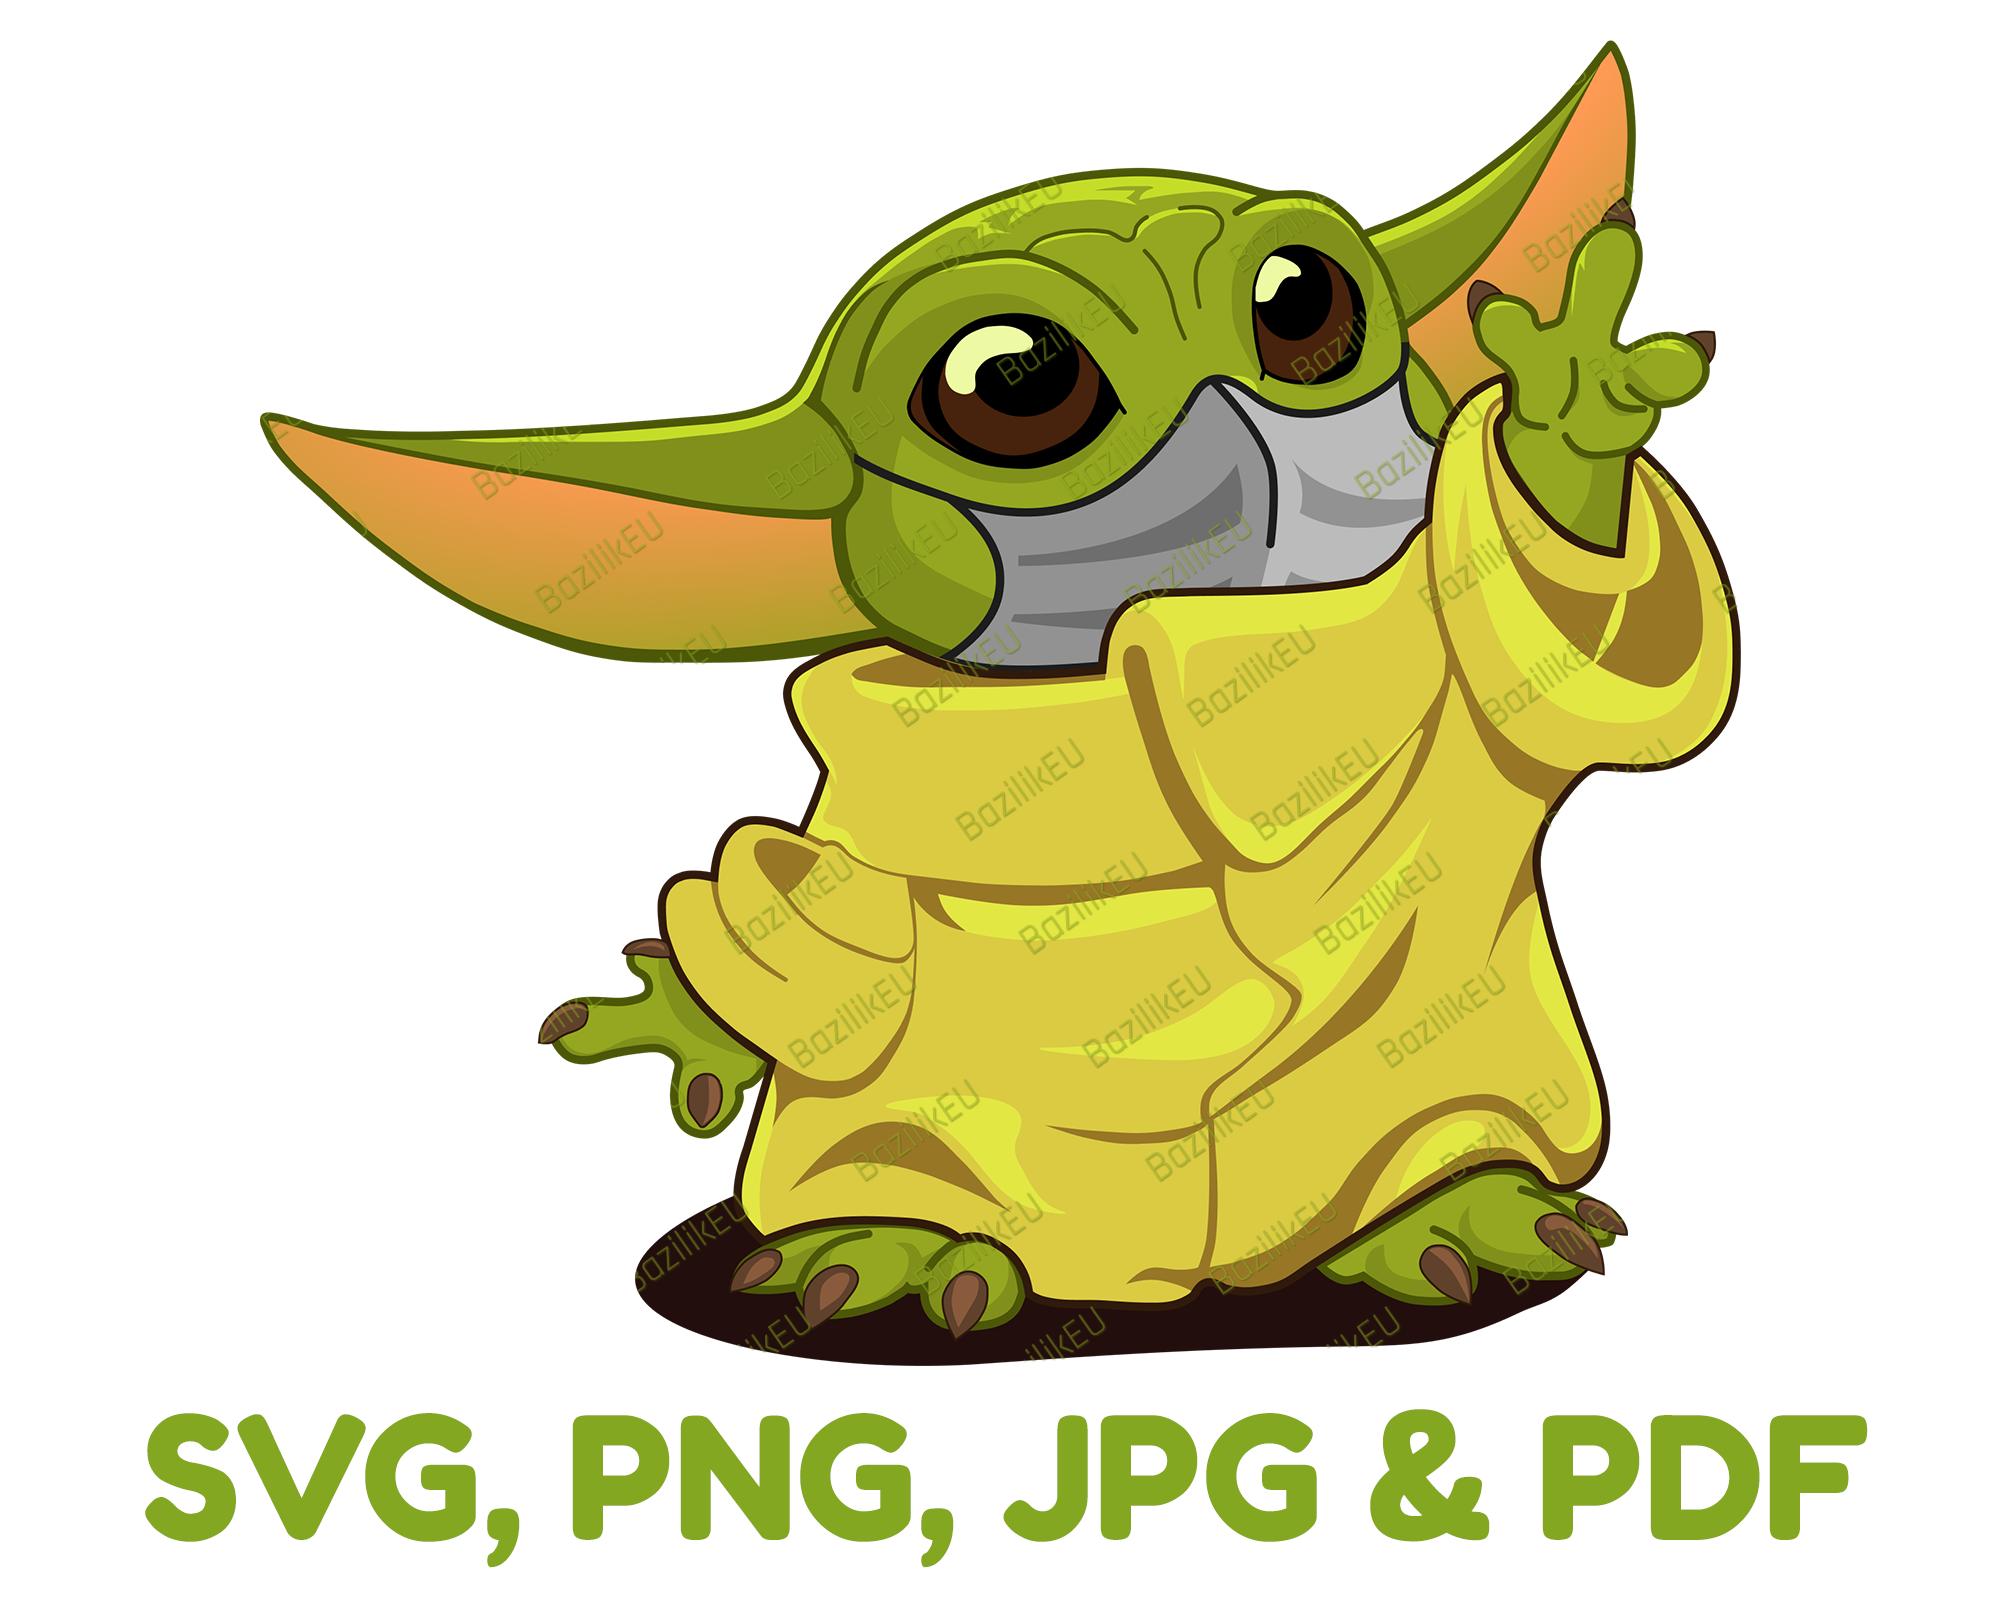 Baby Yoda Svg Mask Printable Bundle Mandalorian Baby Svg Star Wars Svg Disney Svg Tshirt Yoda Design Mug Baby Yoda Digital Print In 2021 Yoda Png Yoda Clipart Yoda